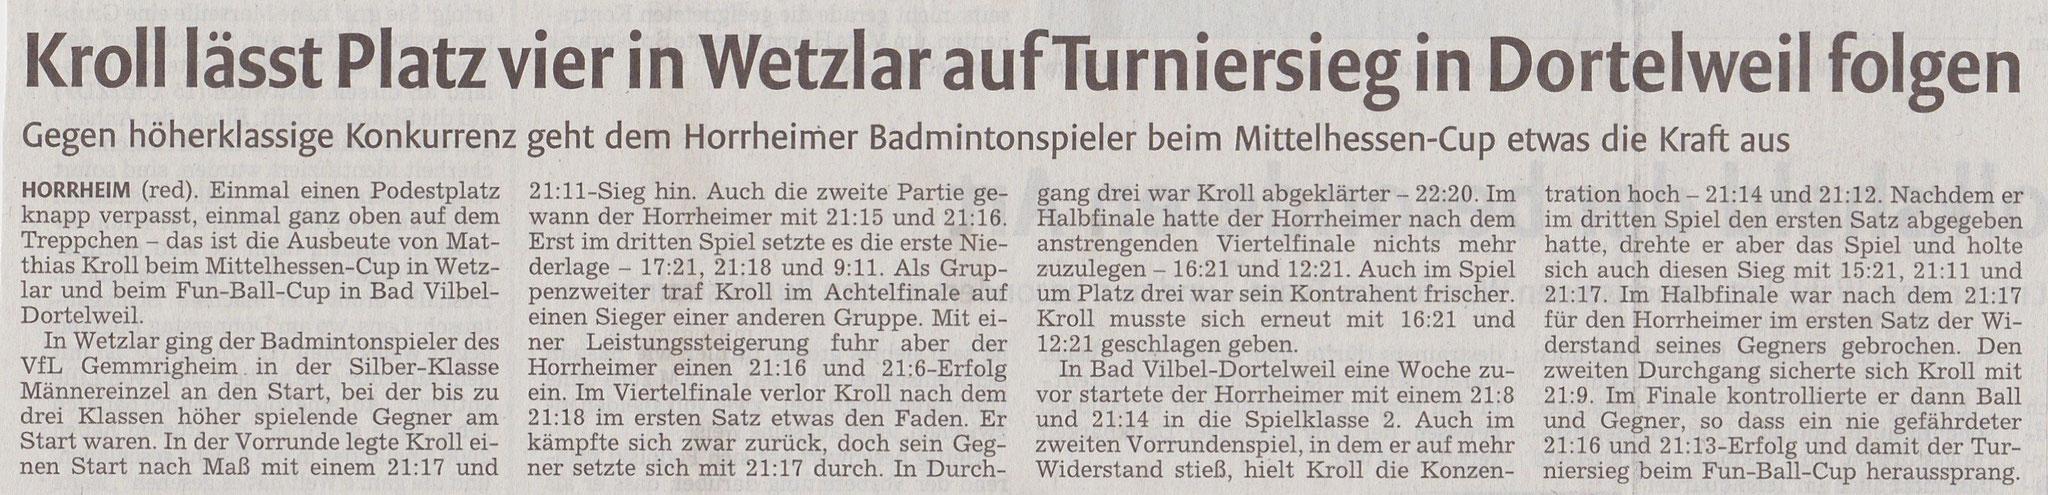 Bericht vkz zum Mittelhessen-Cup Wetzlar